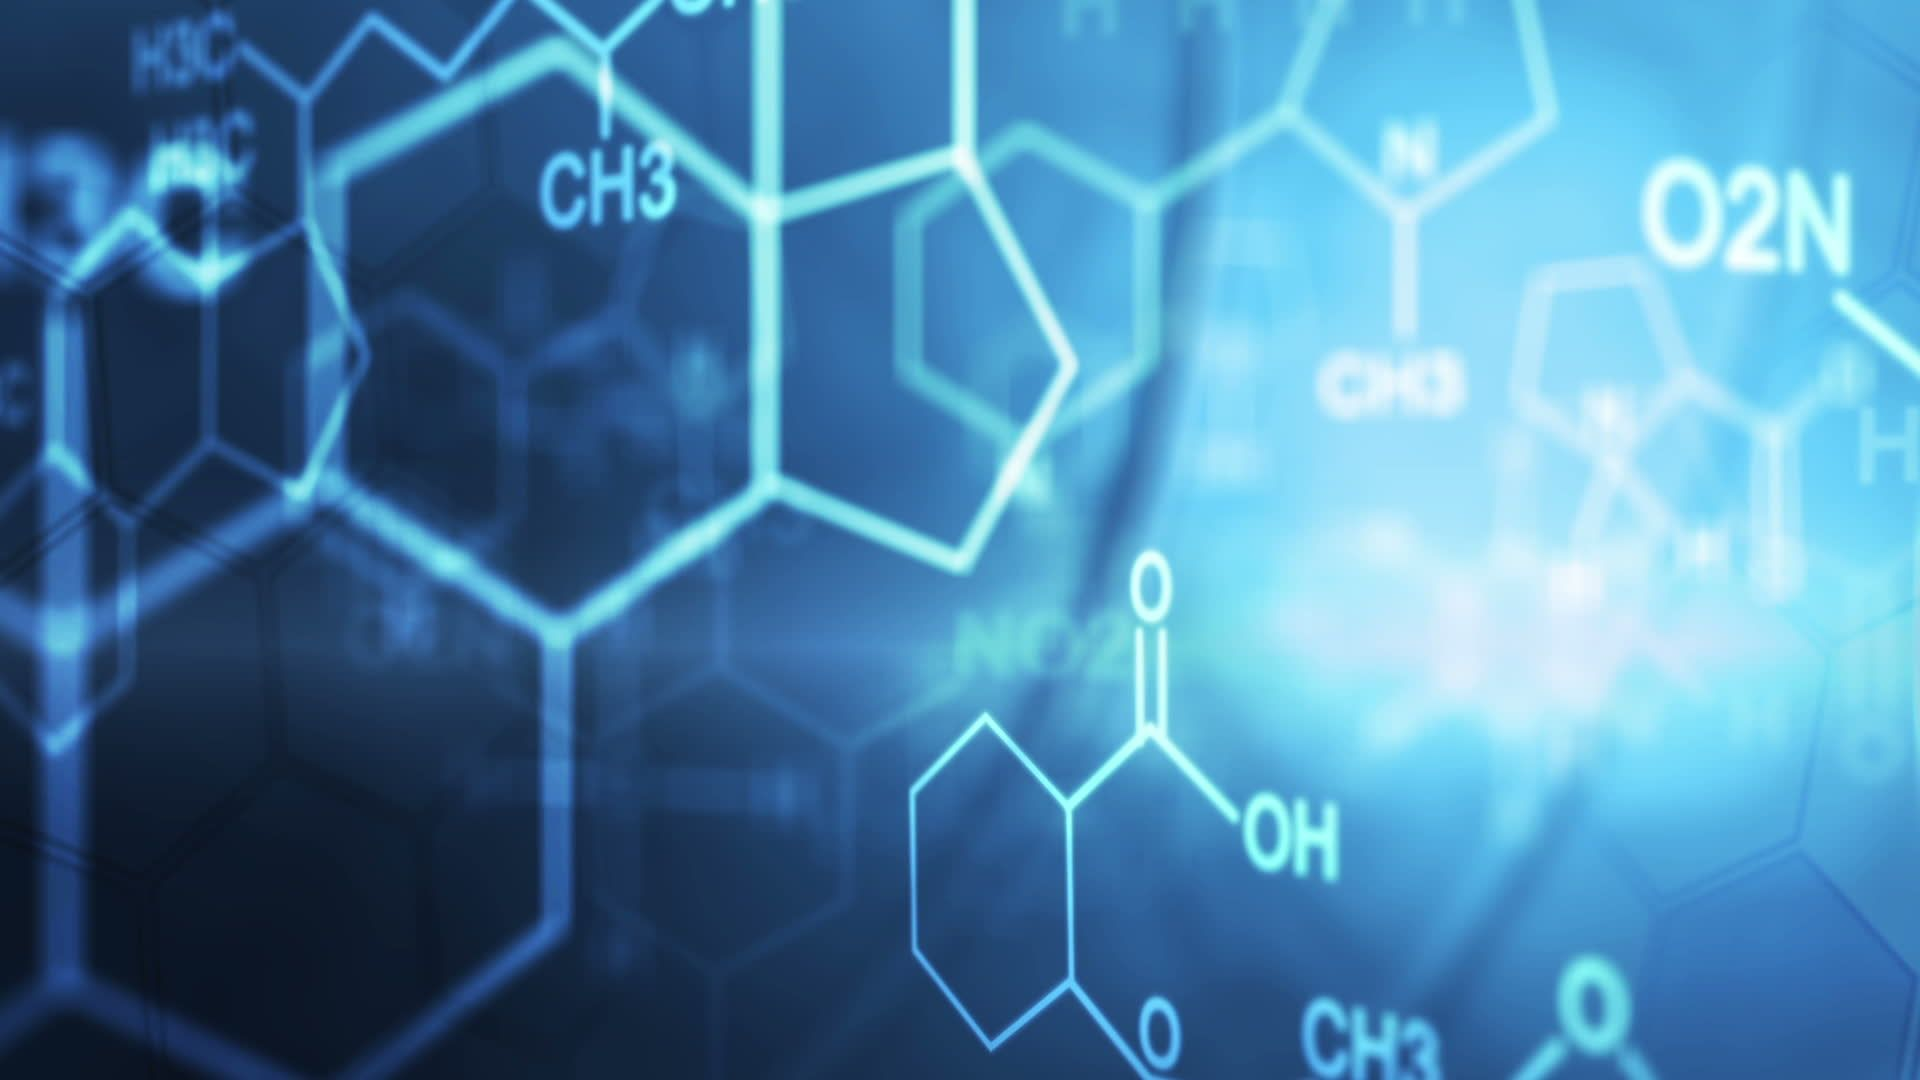 Organic Chemistry Wallpaper - WallpaperSafari   Organic chemistry in 2019   Pinterest   Science ...